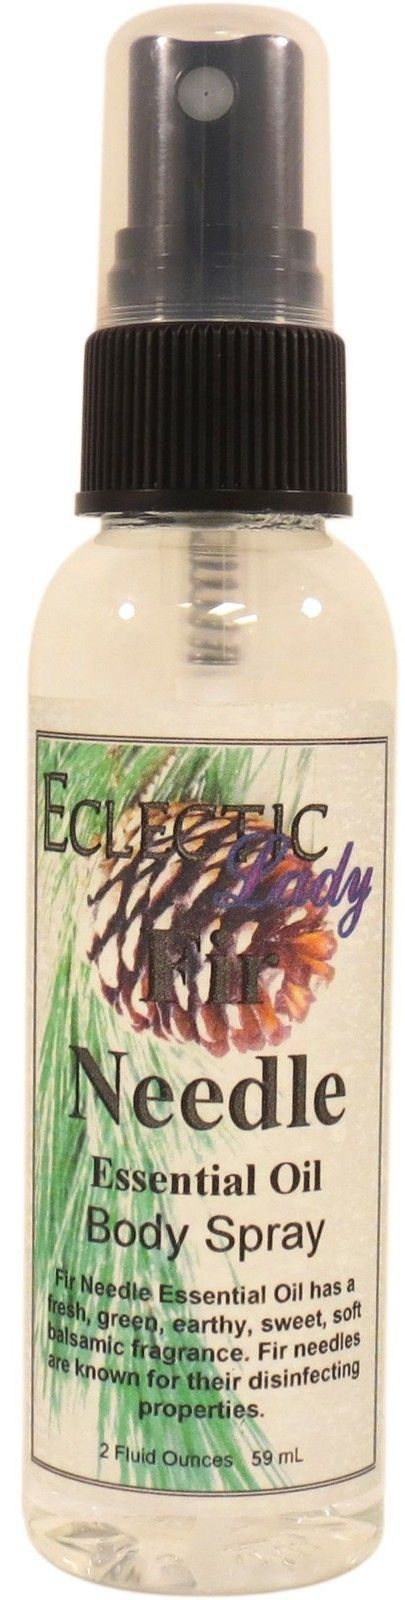 Fir Needle Essential Oil Body Spray